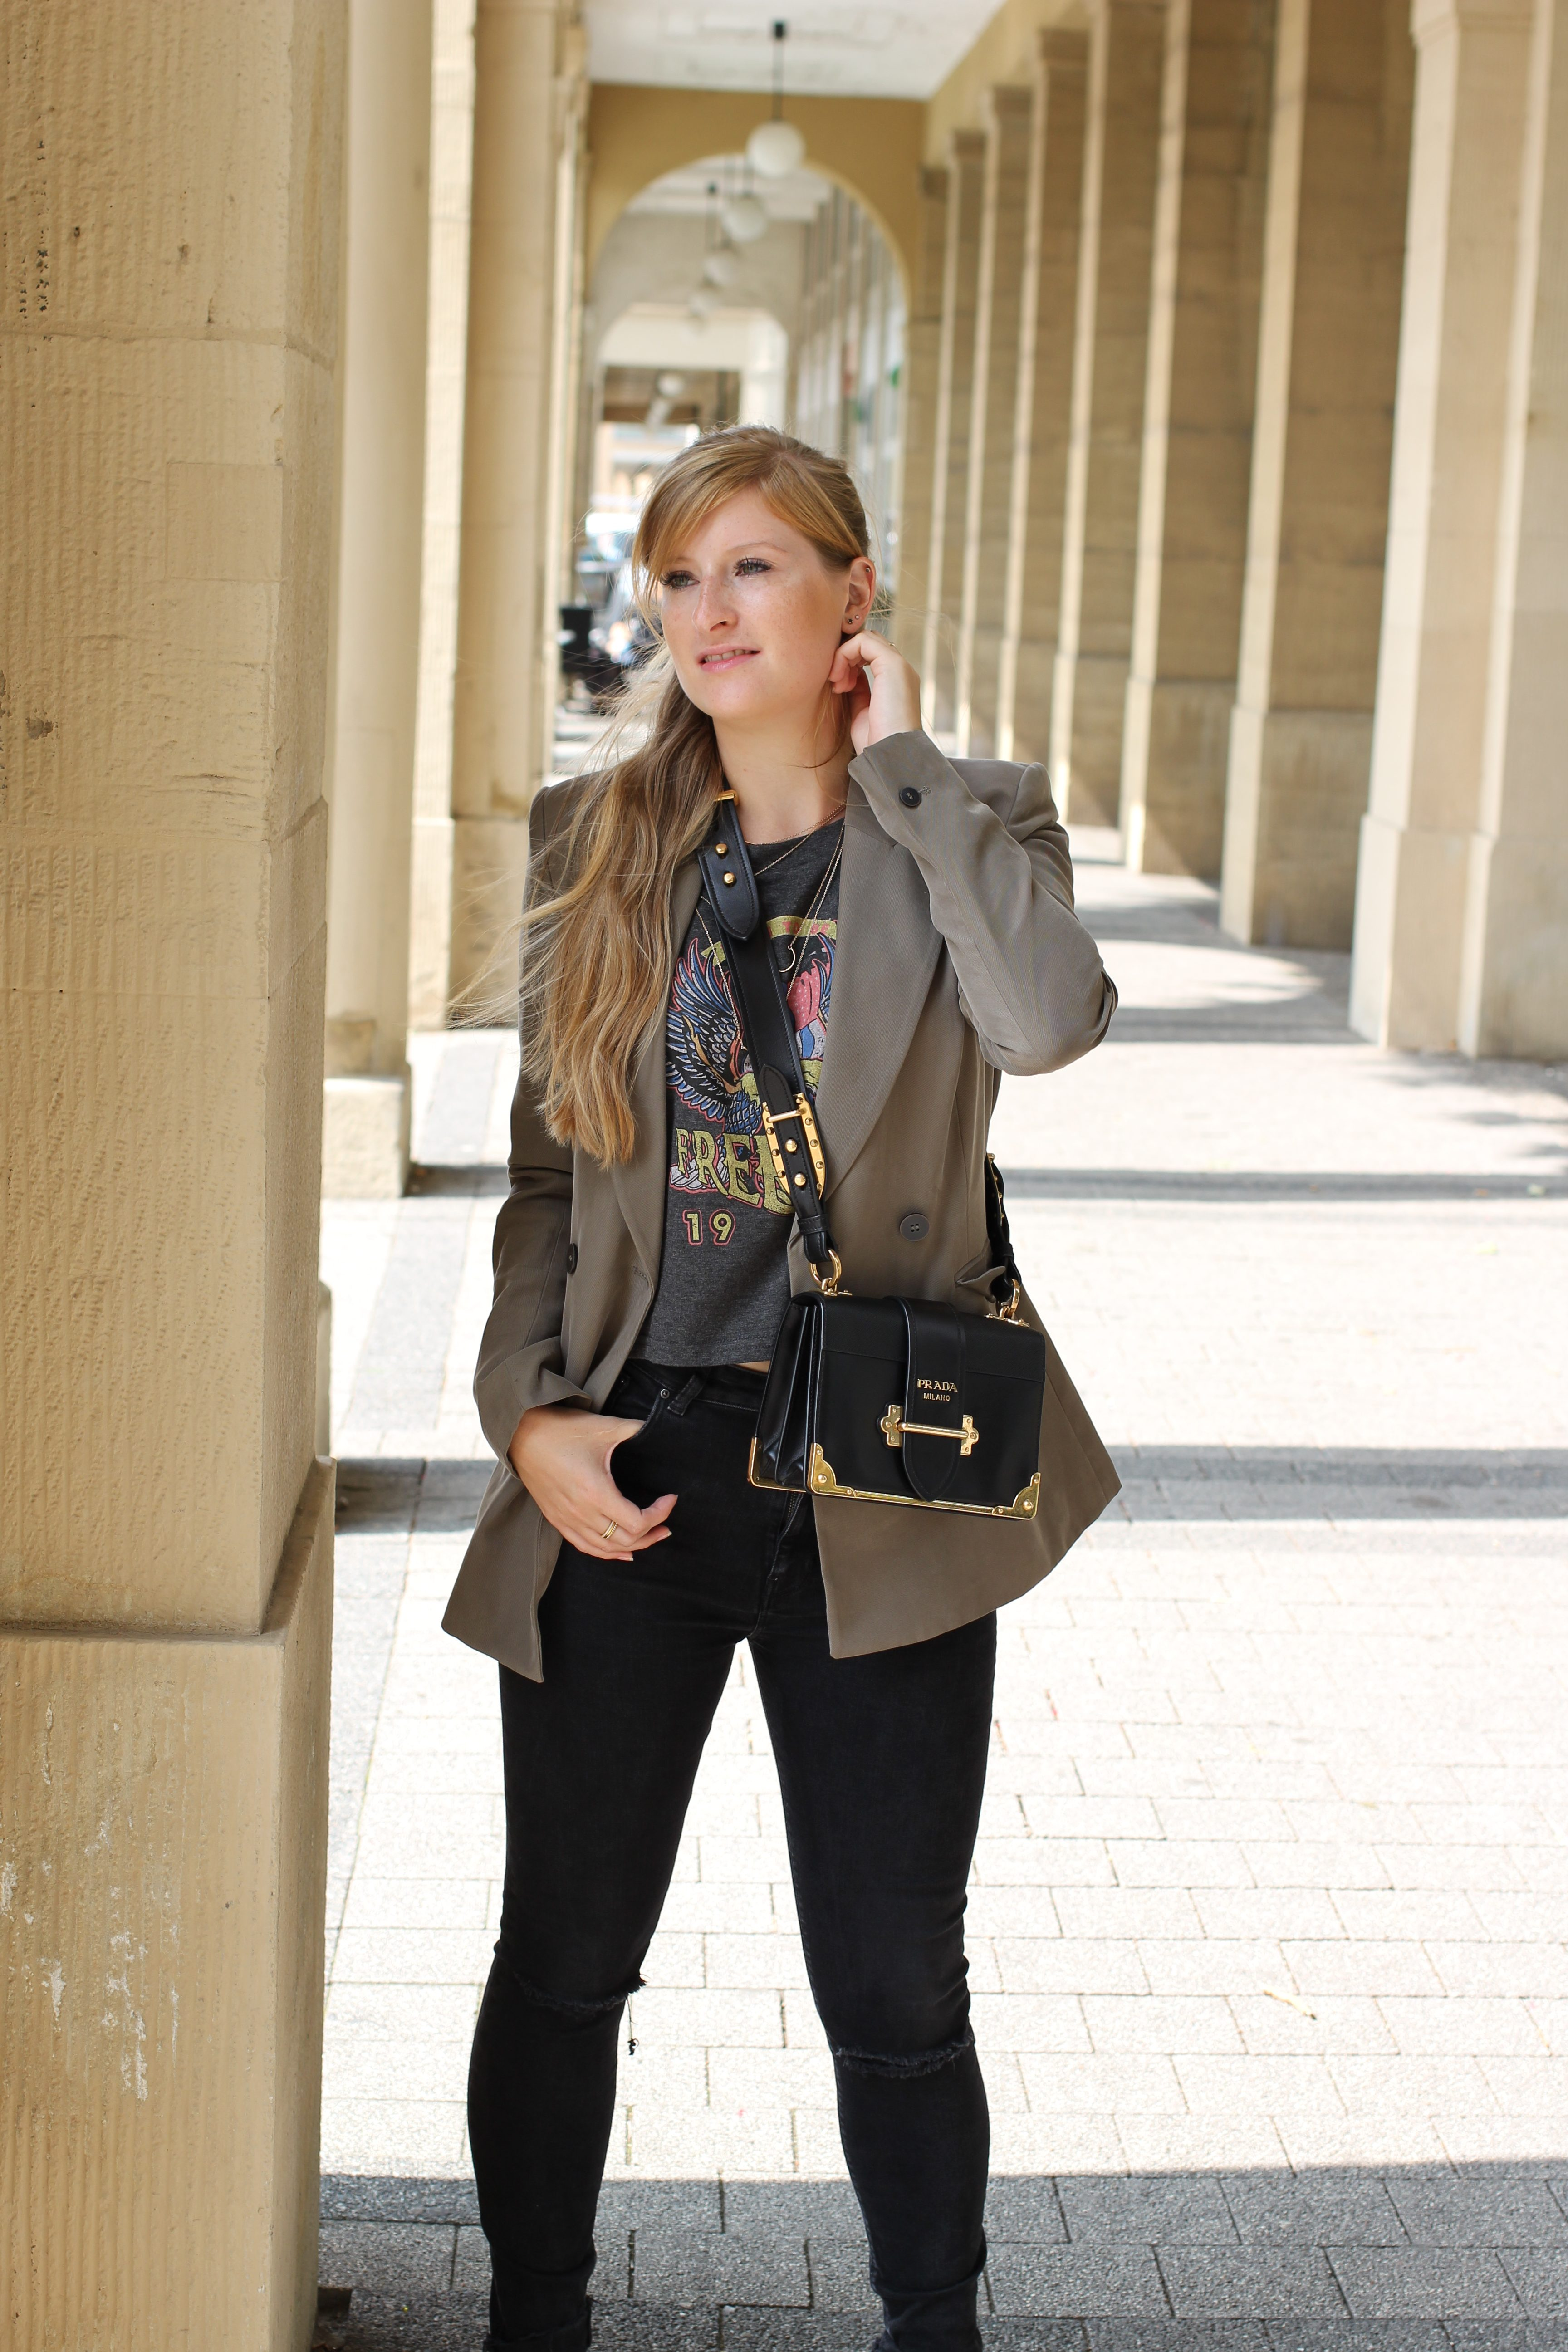 Highwaist Jeans Crop Top Print kombinieren Lieblings-Blazer Zara Blazer Navy Grün Prada Cahier Bag Frühlingslook Outfit Modeblog Karlsruhe 3 Half Bun